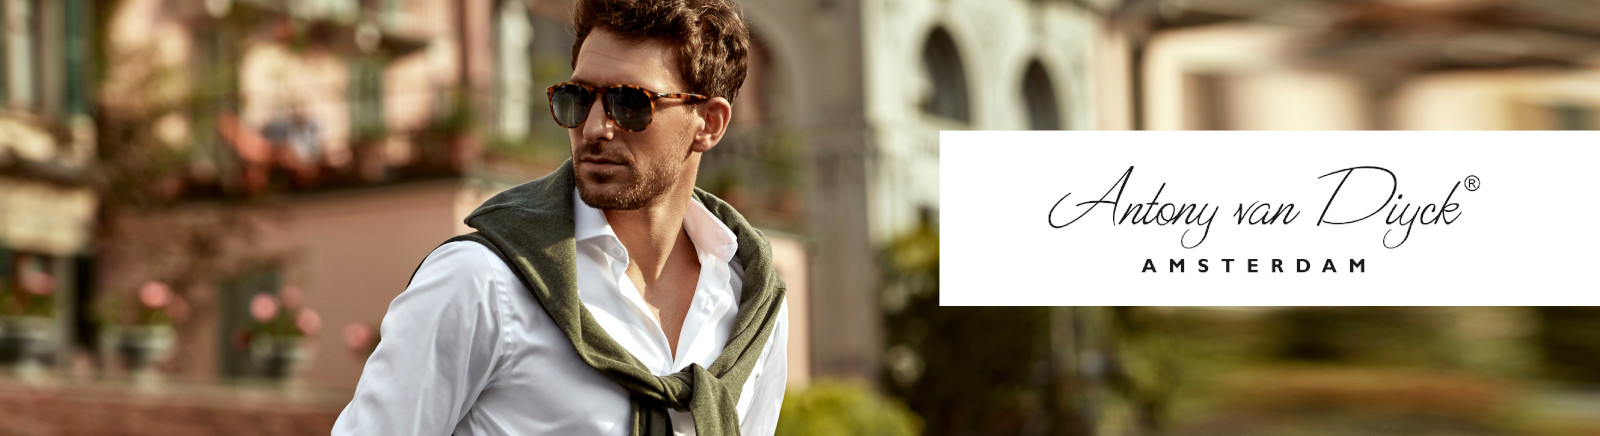 Antony van Diyck Markenschuhe online kaufen bei Prange Schuhe